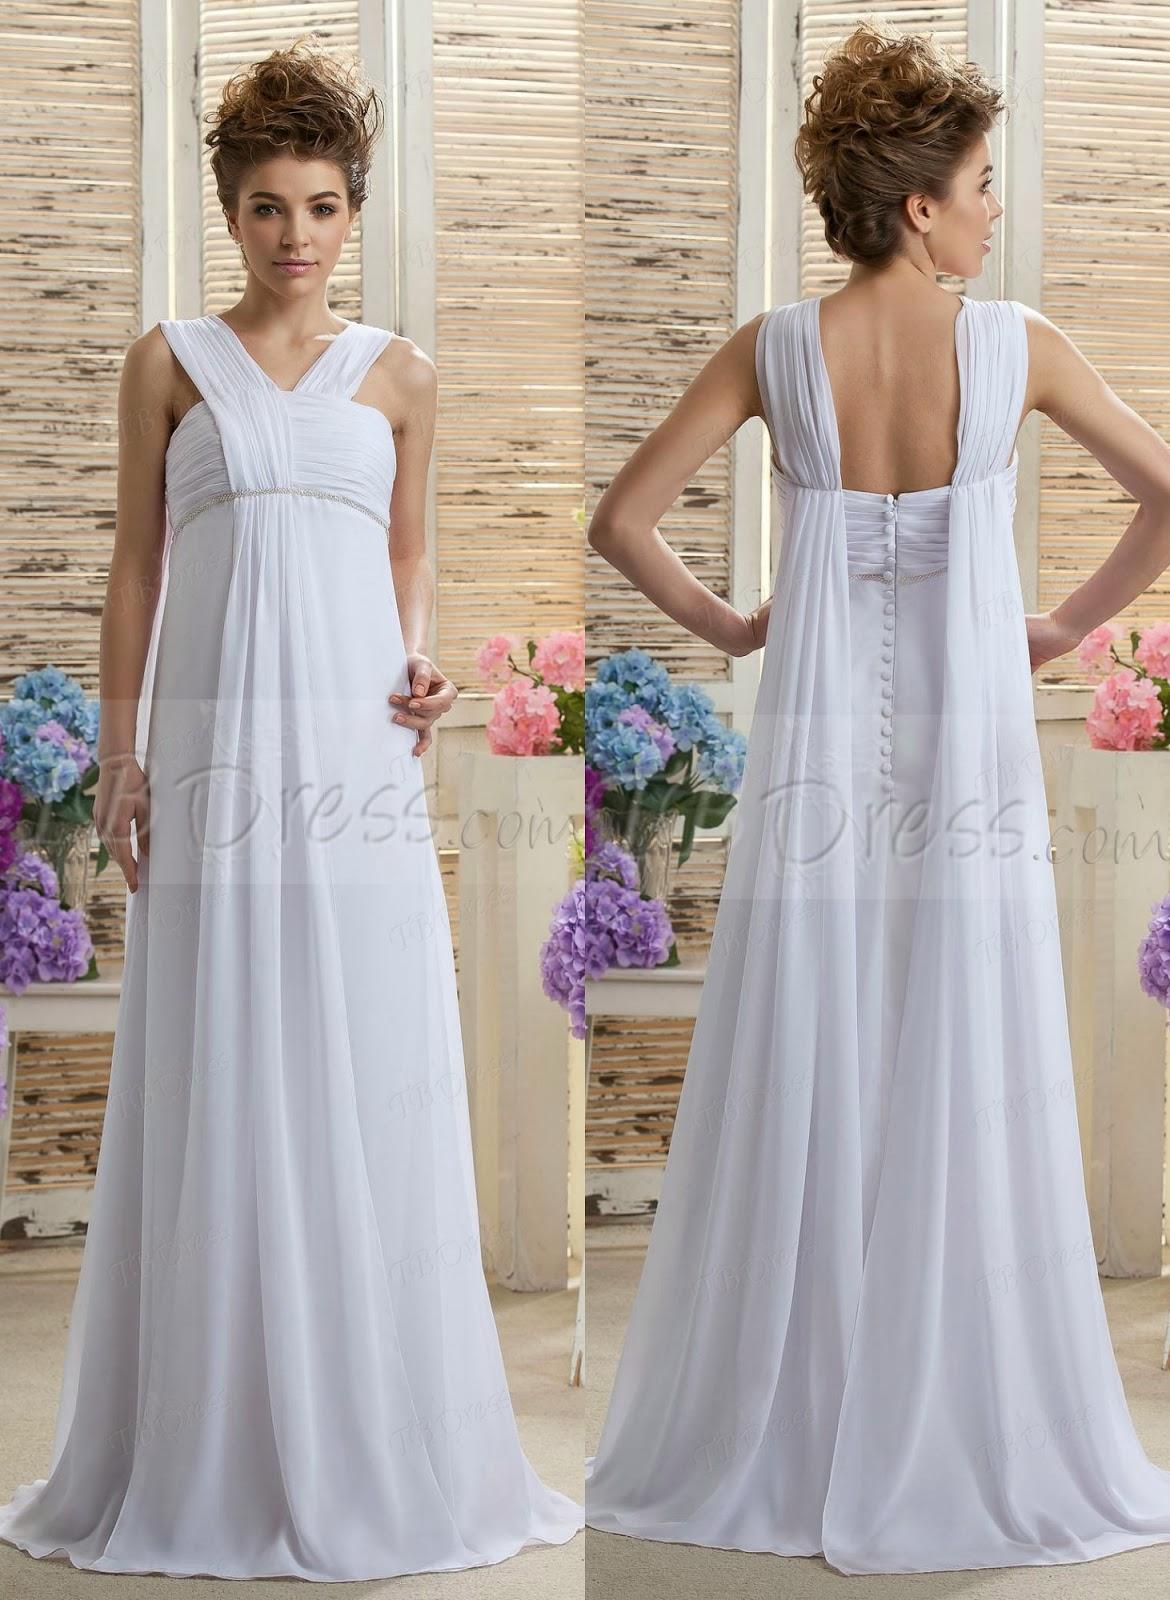 Maternity Weding Gowns 019 - Maternity Weding Gowns